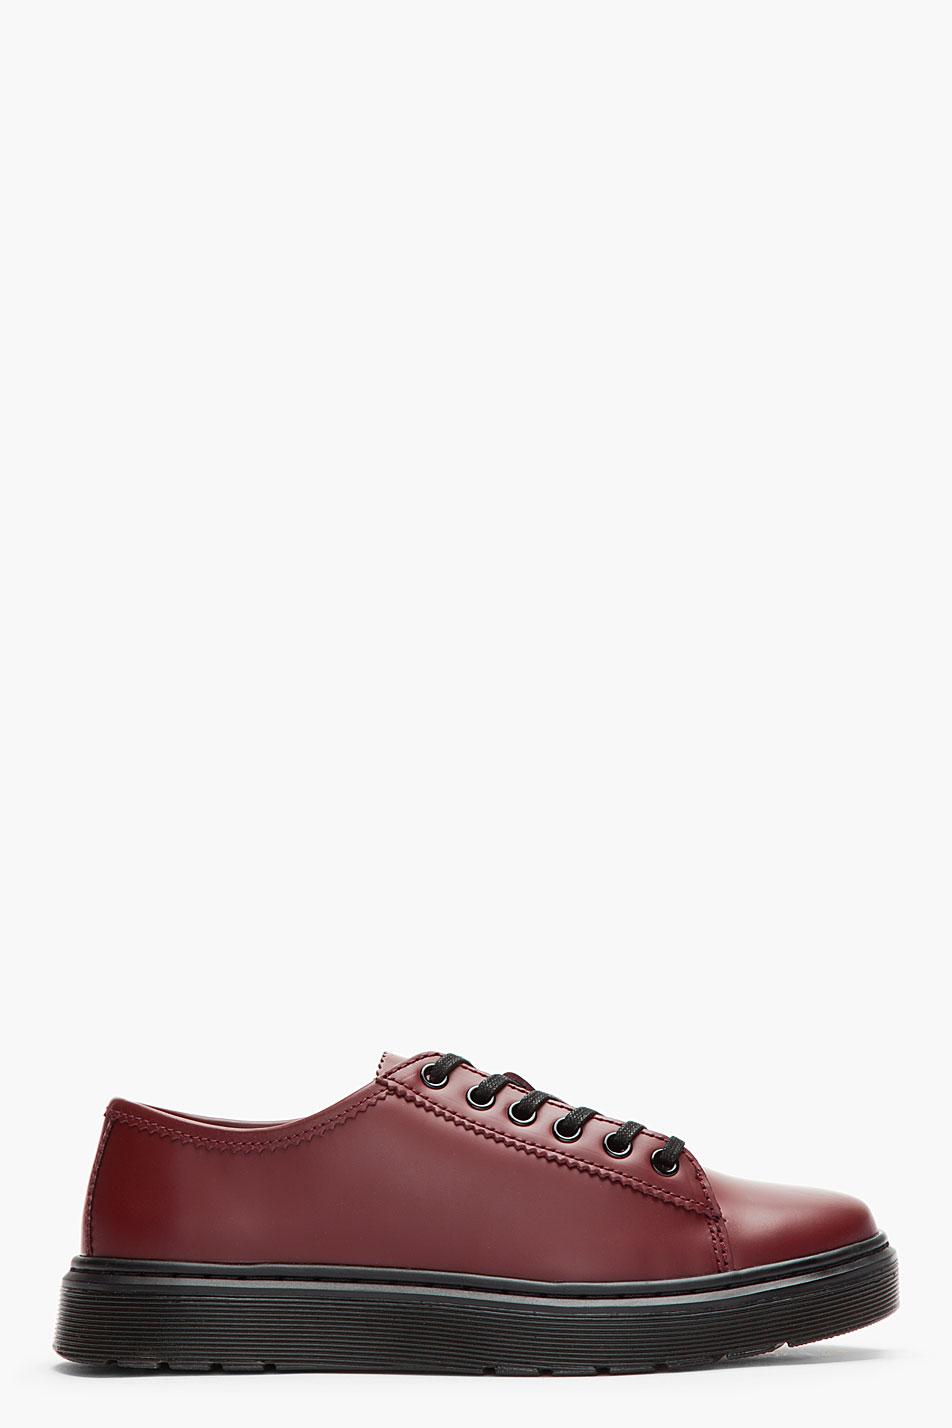 Dr. Martens burgundy sneaker shoe